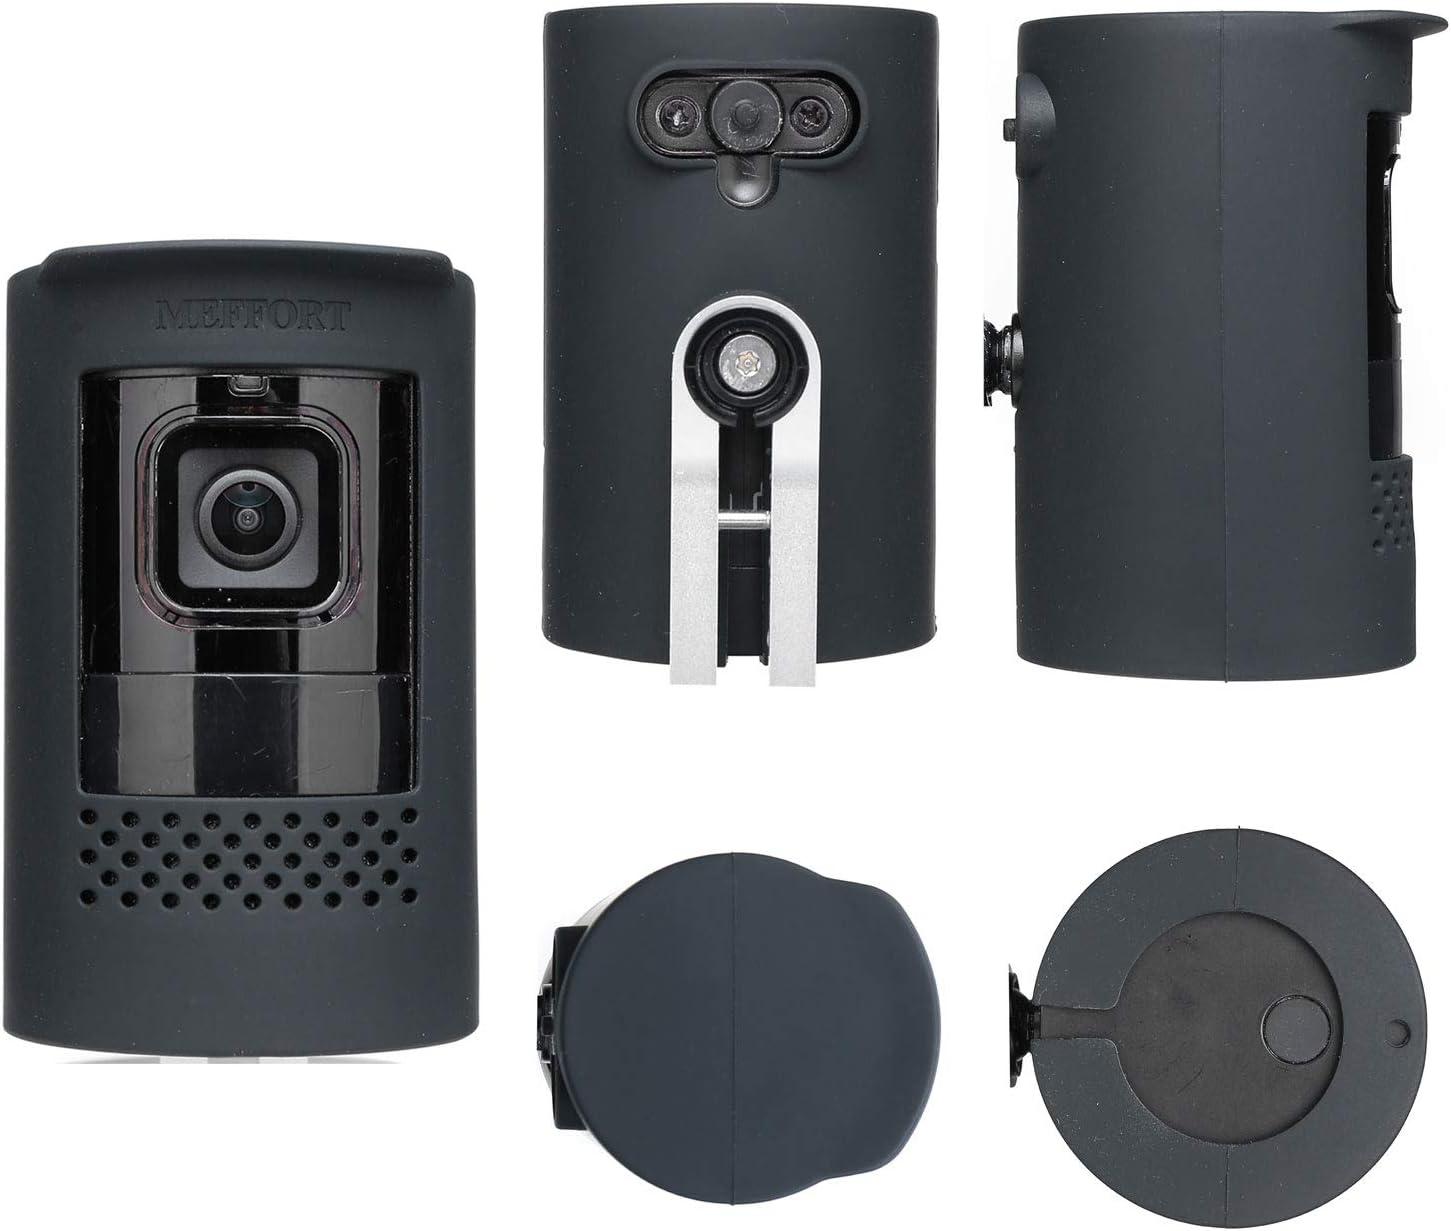 Silikon Schutzhülle Mit Sonnenblendung Uv Und Kamera